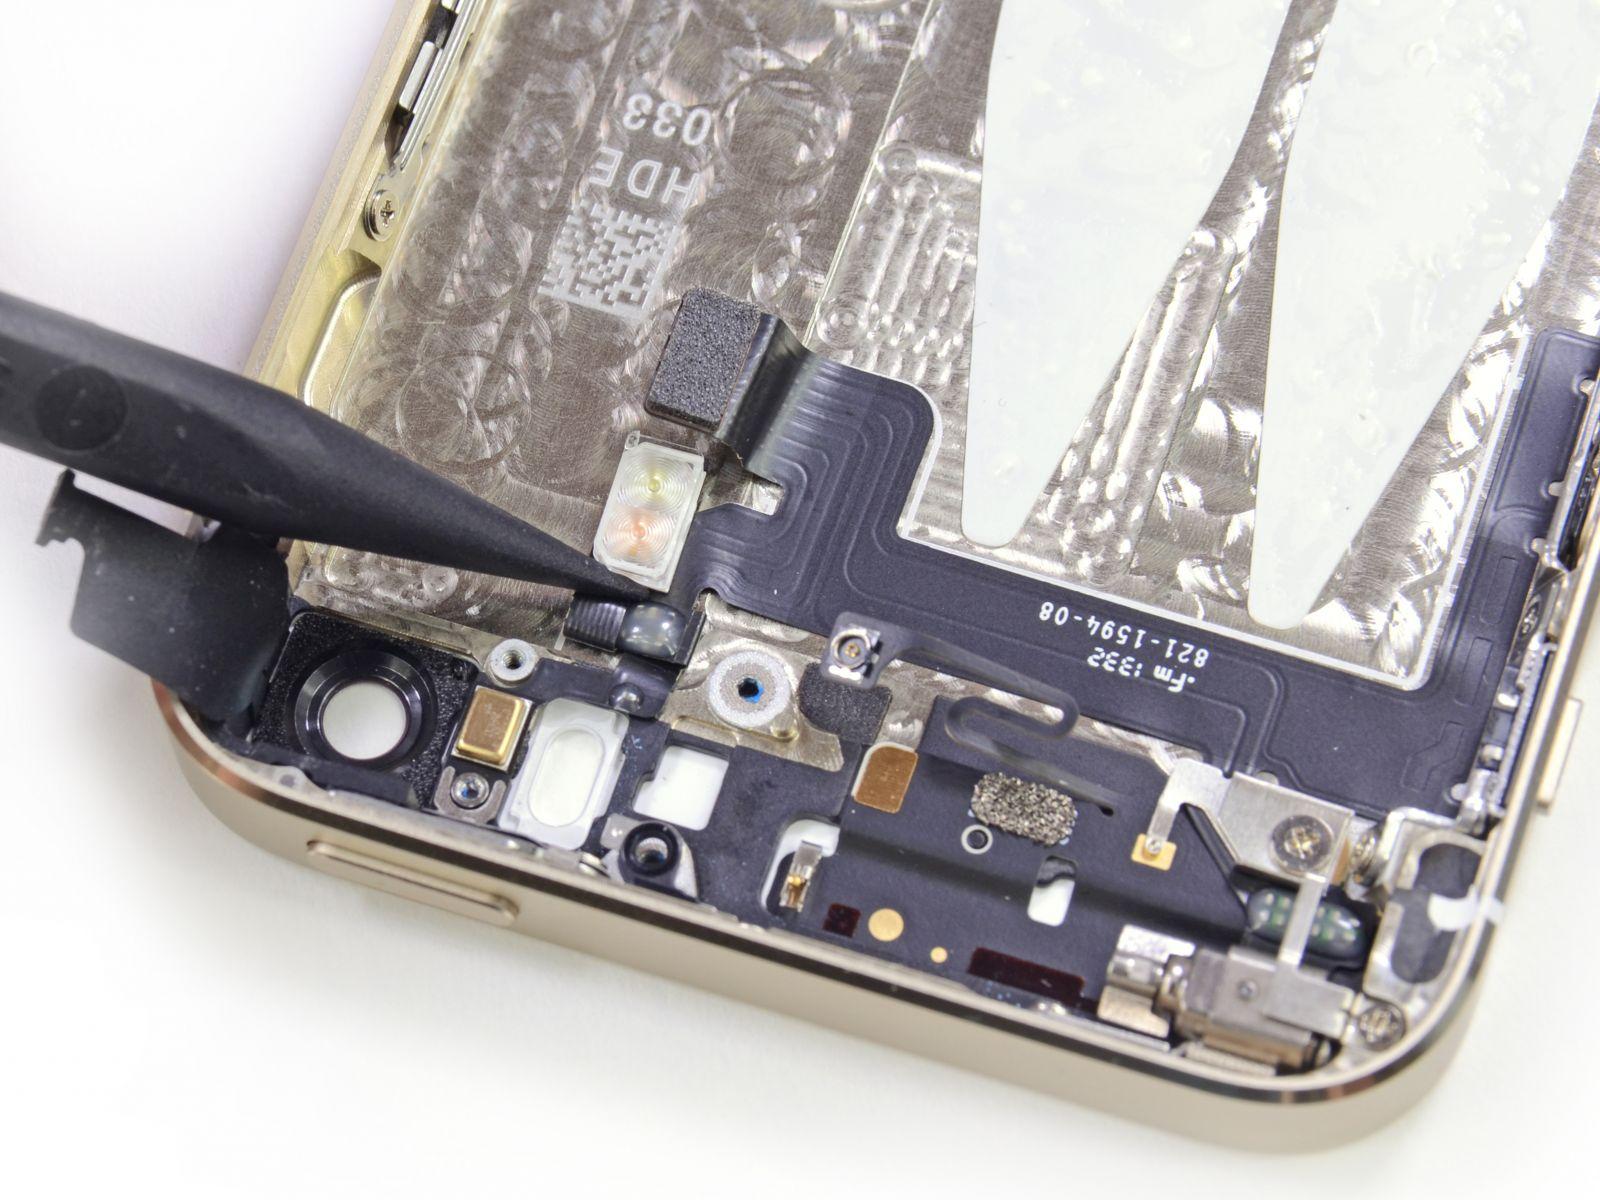 kak-razobrat-iphone-5s-45